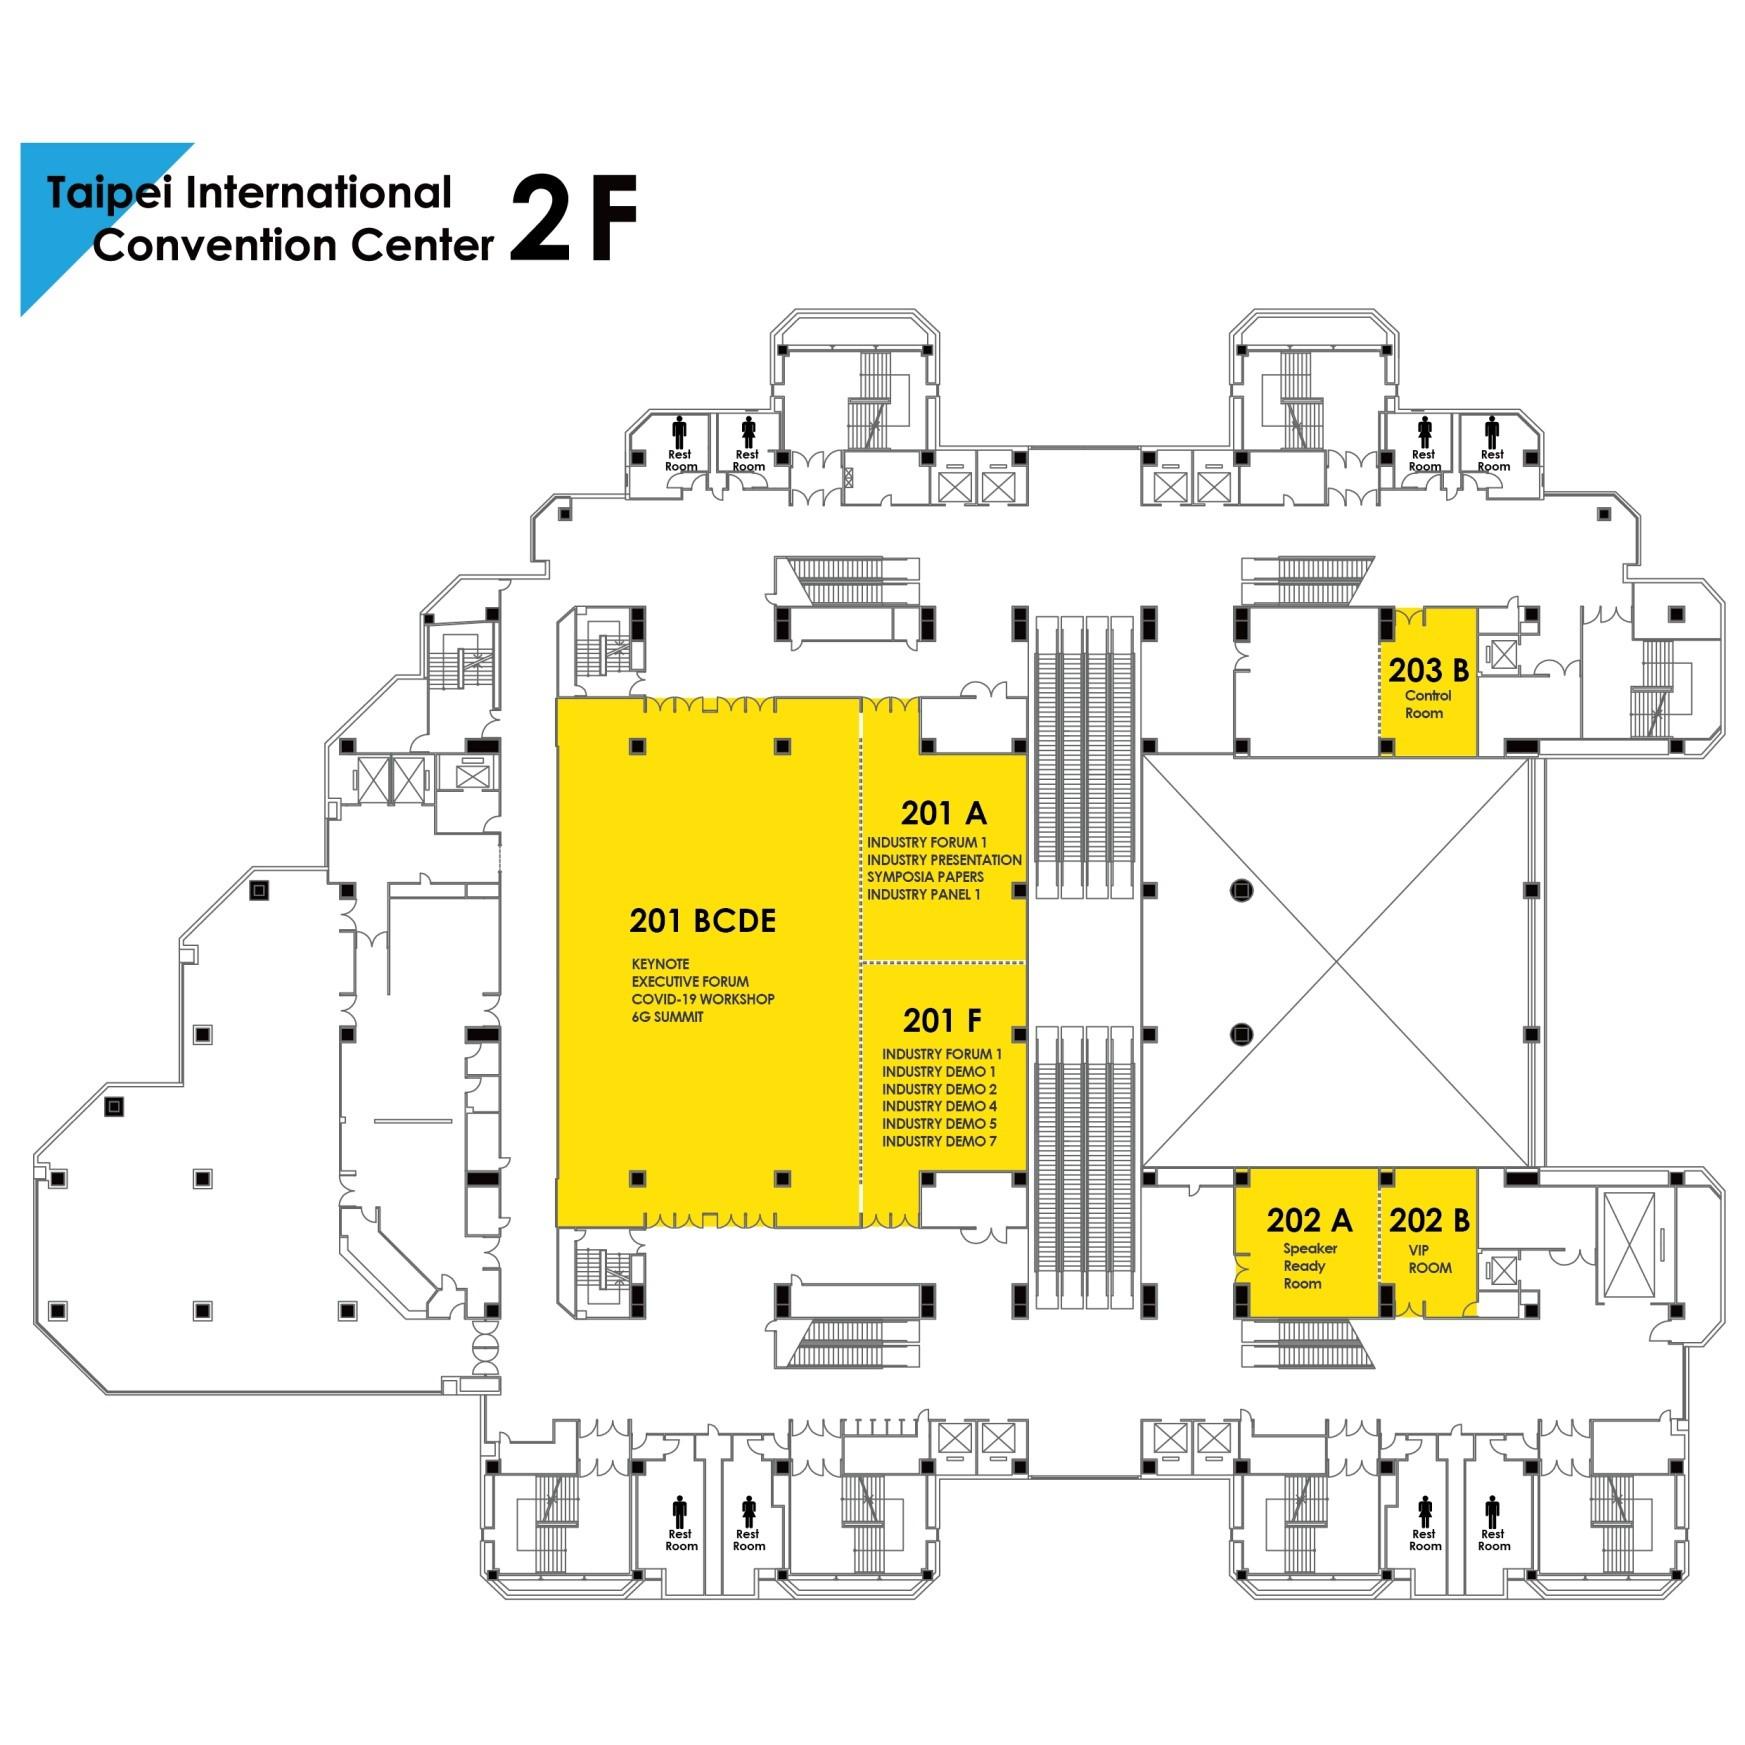 TICC Venue Floor Map 2F